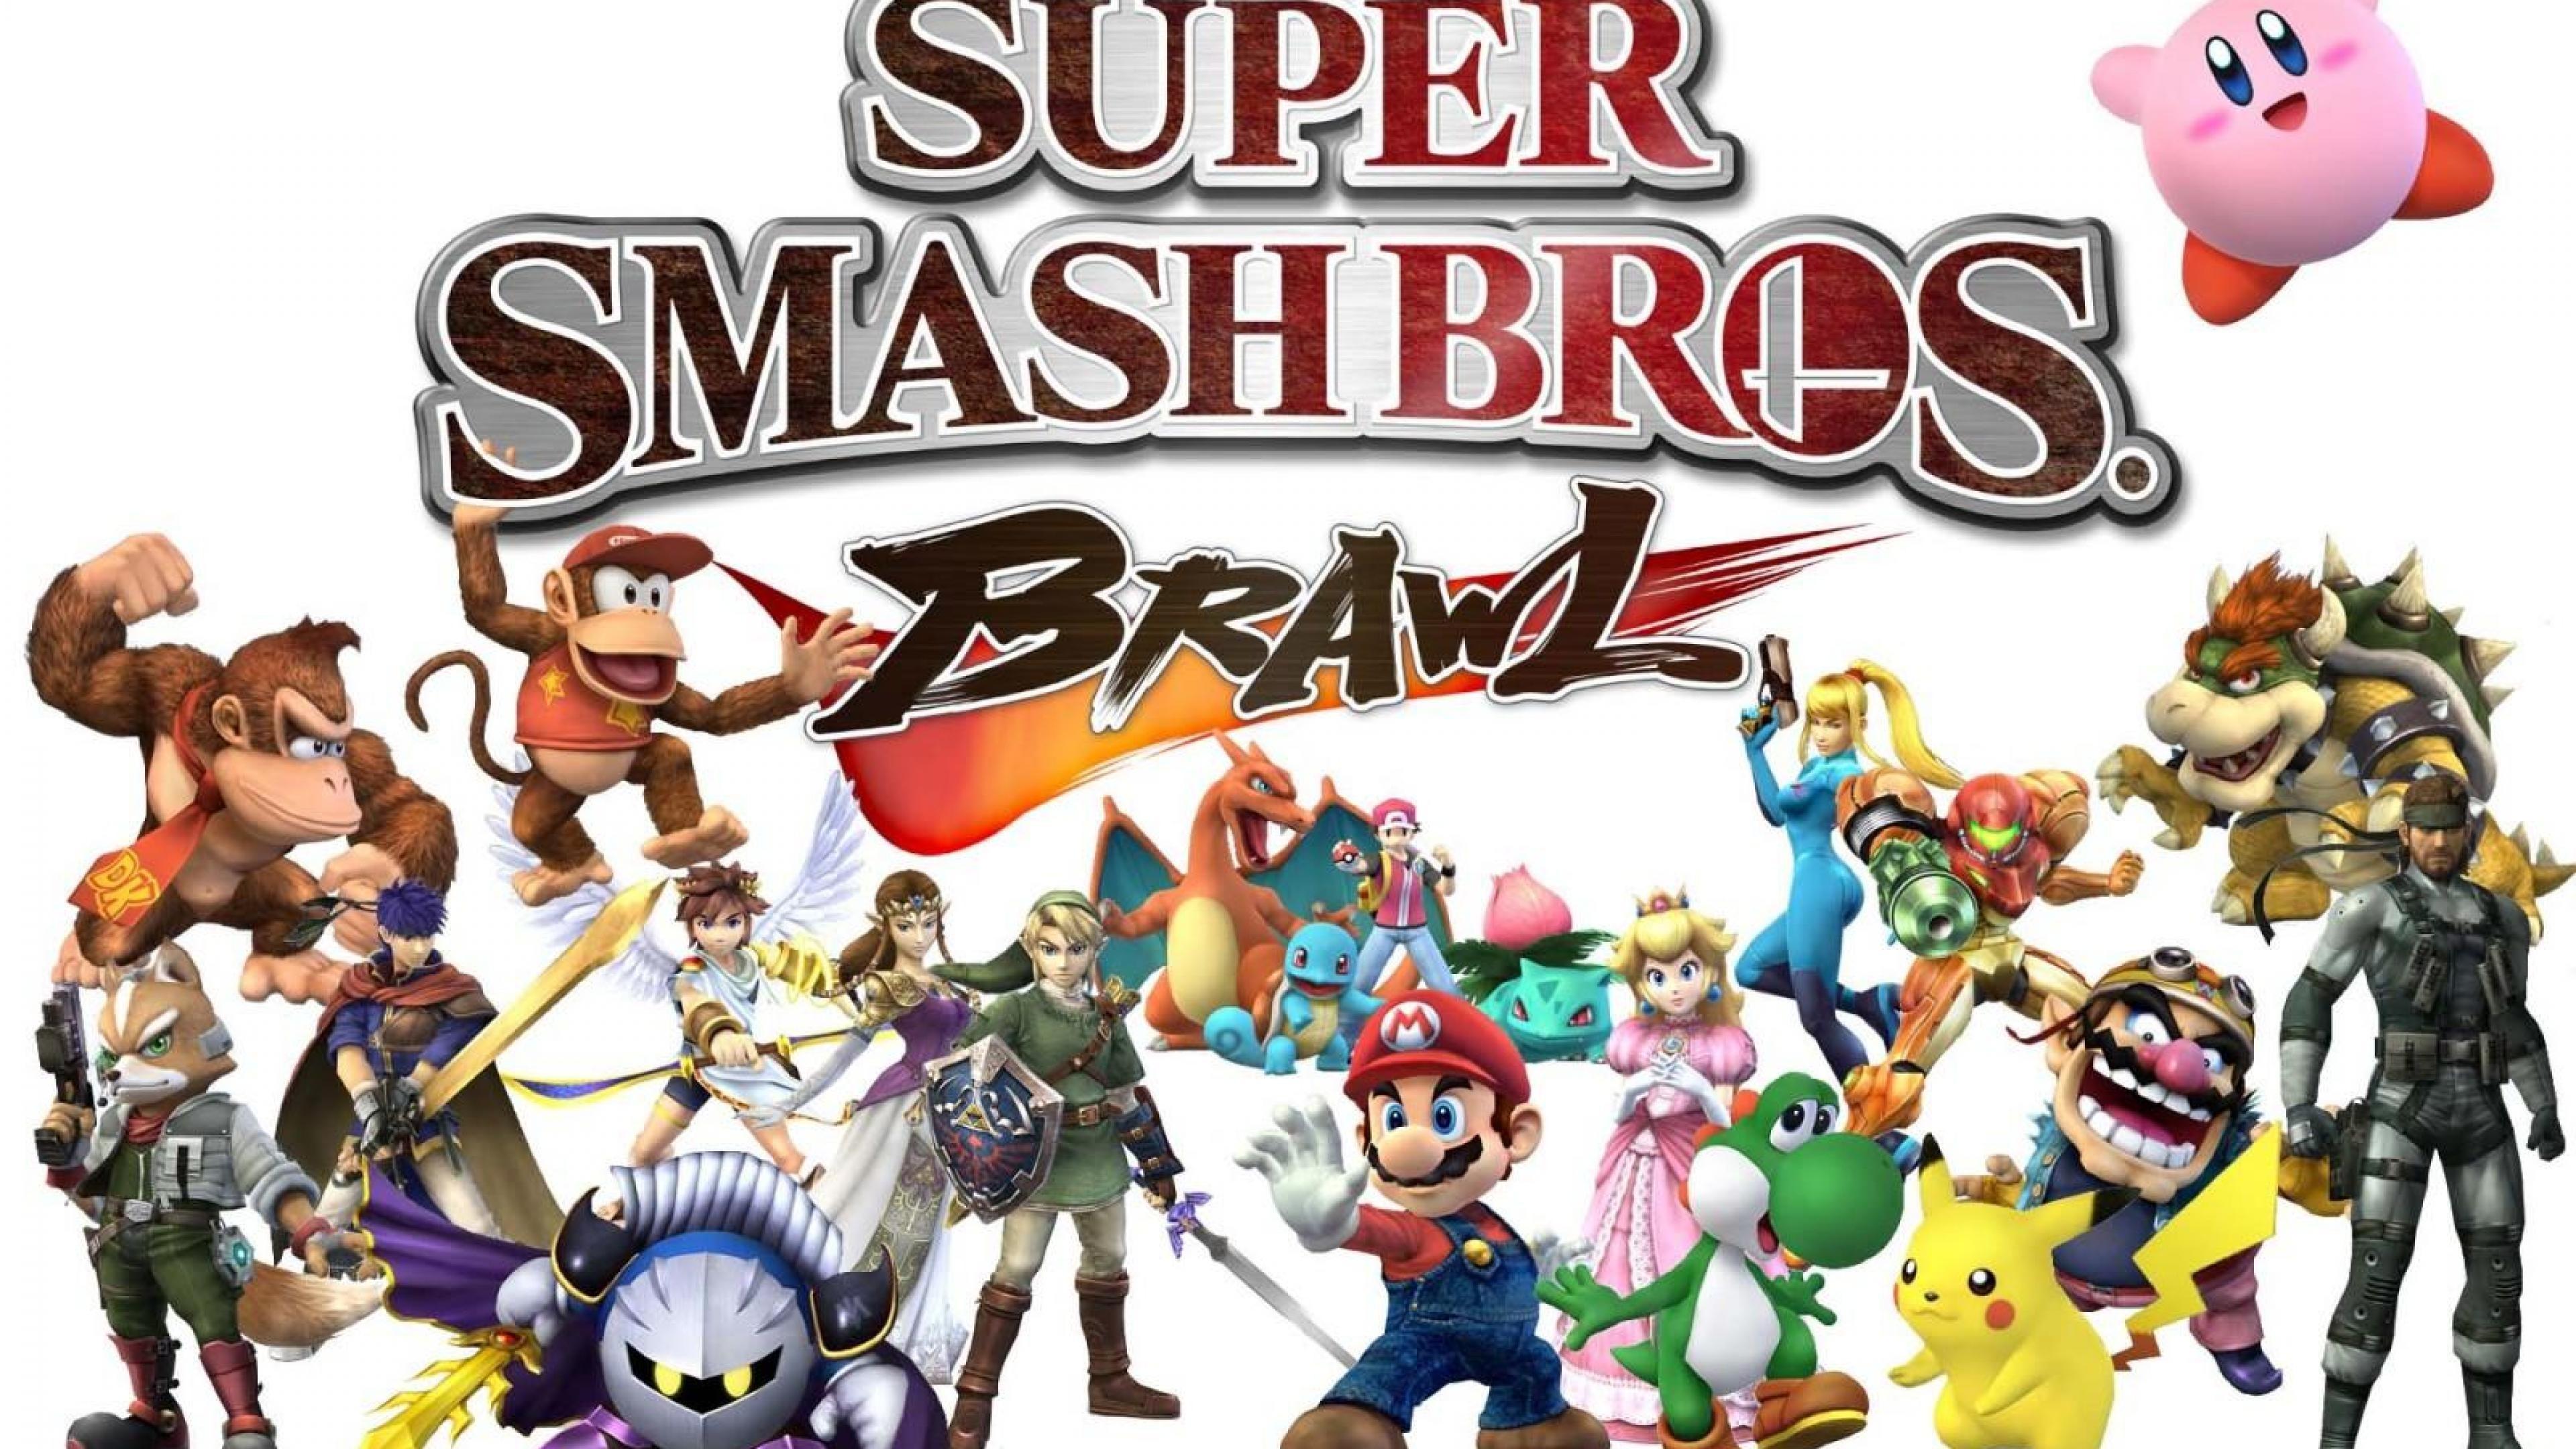 super smash bros brawl wallpaper 183��